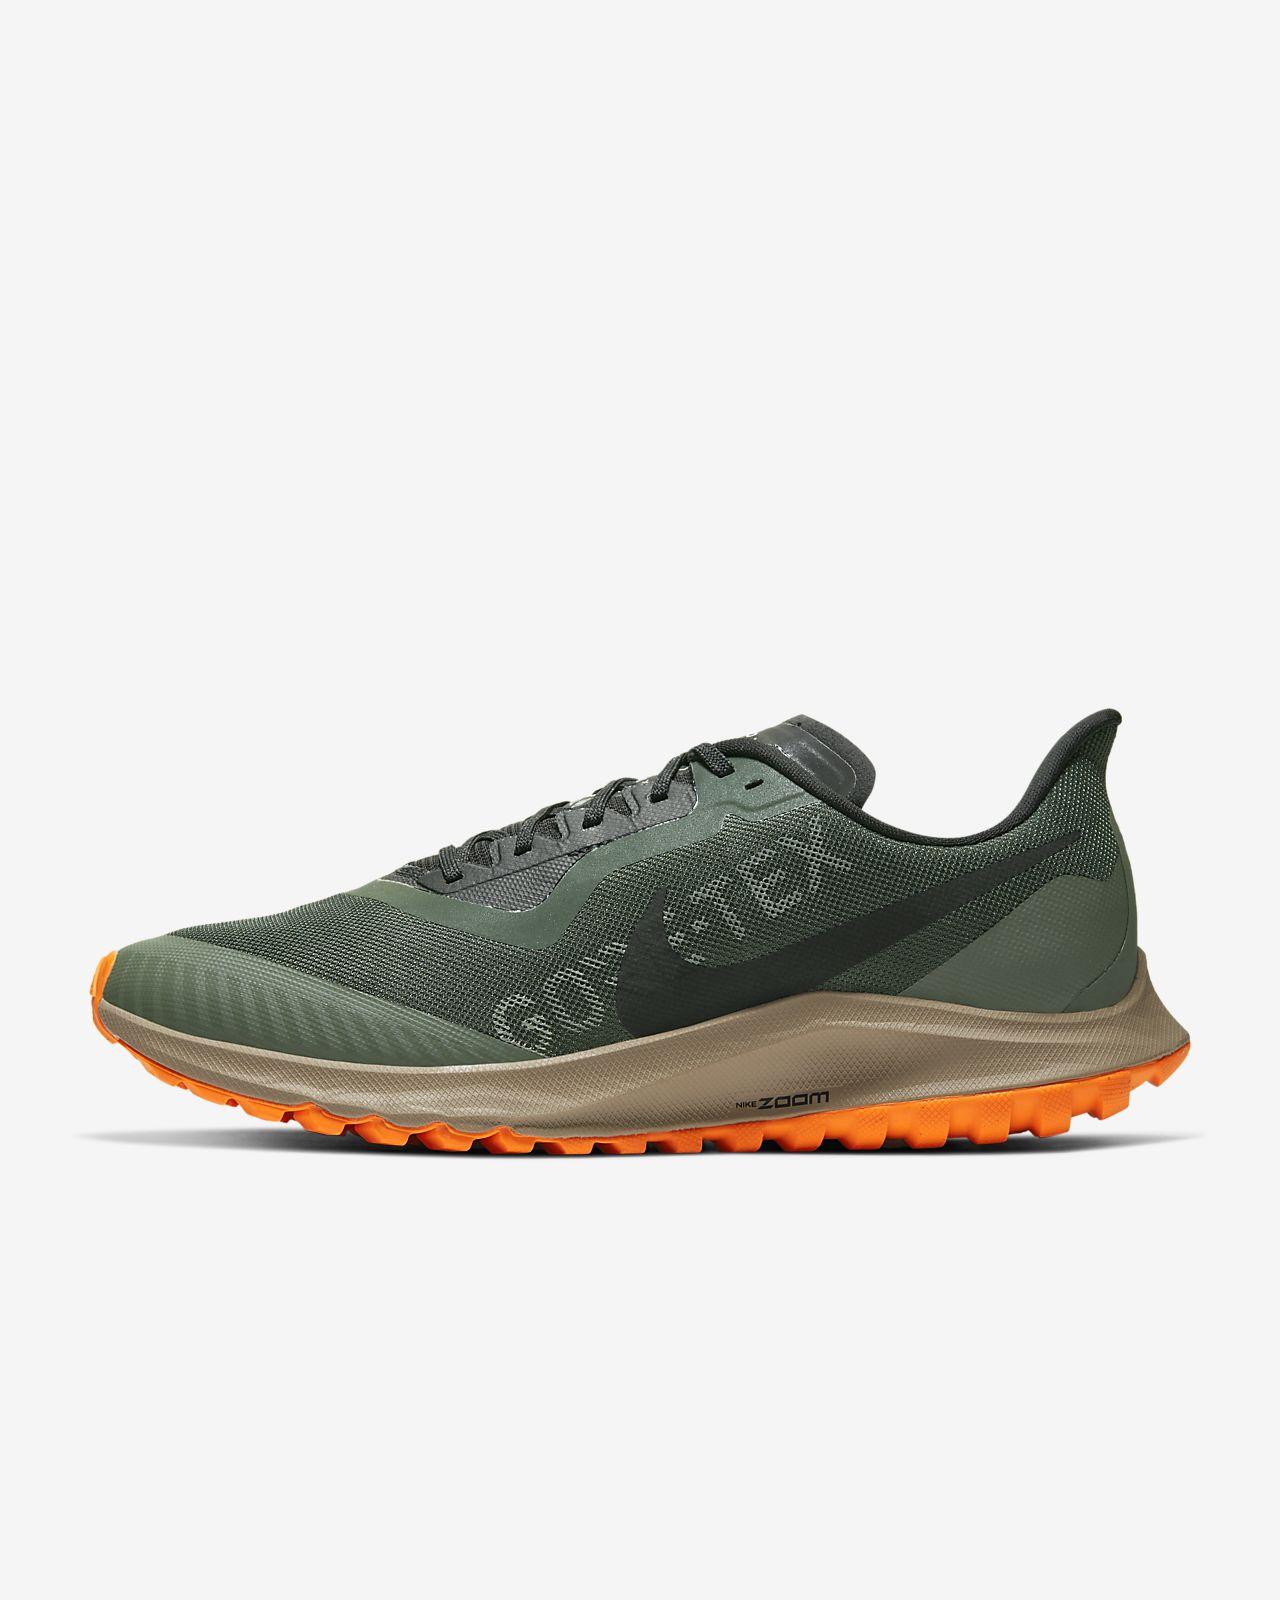 Nike Zoom Pegasus 36 Trail GORE-TEX Men's Trail Running Shoe